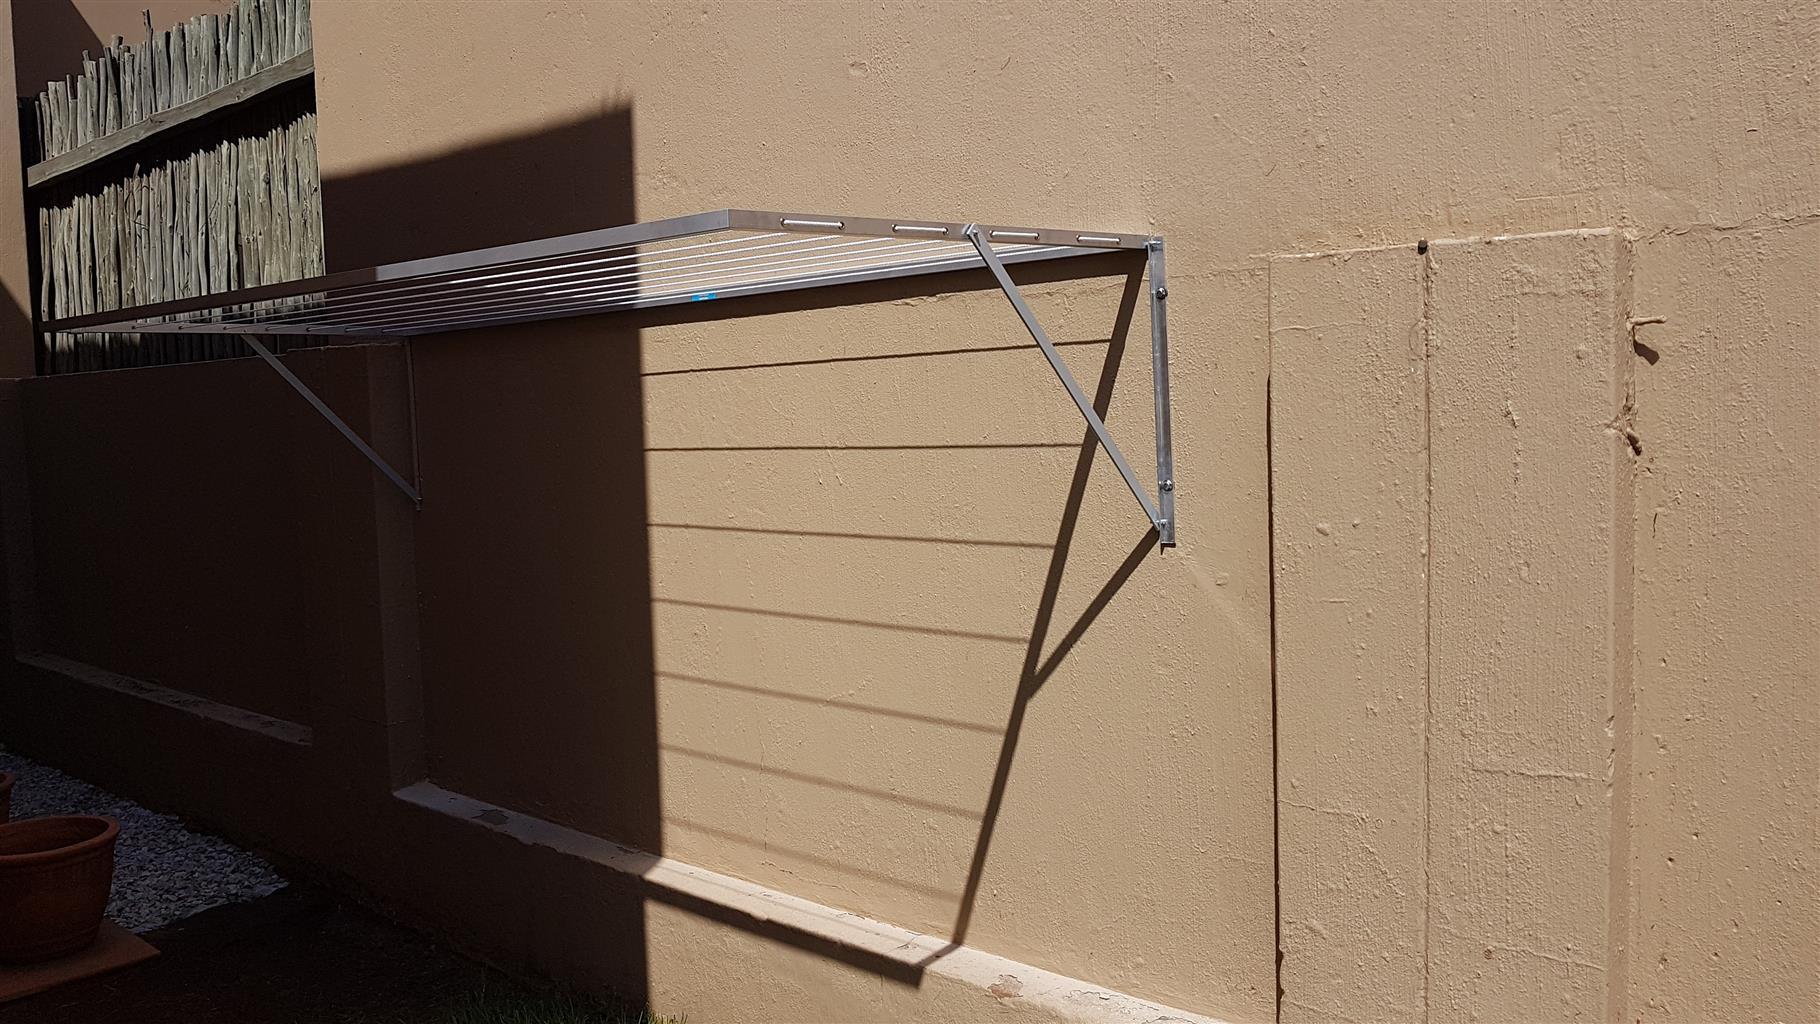 Aluminium fold away wash-line